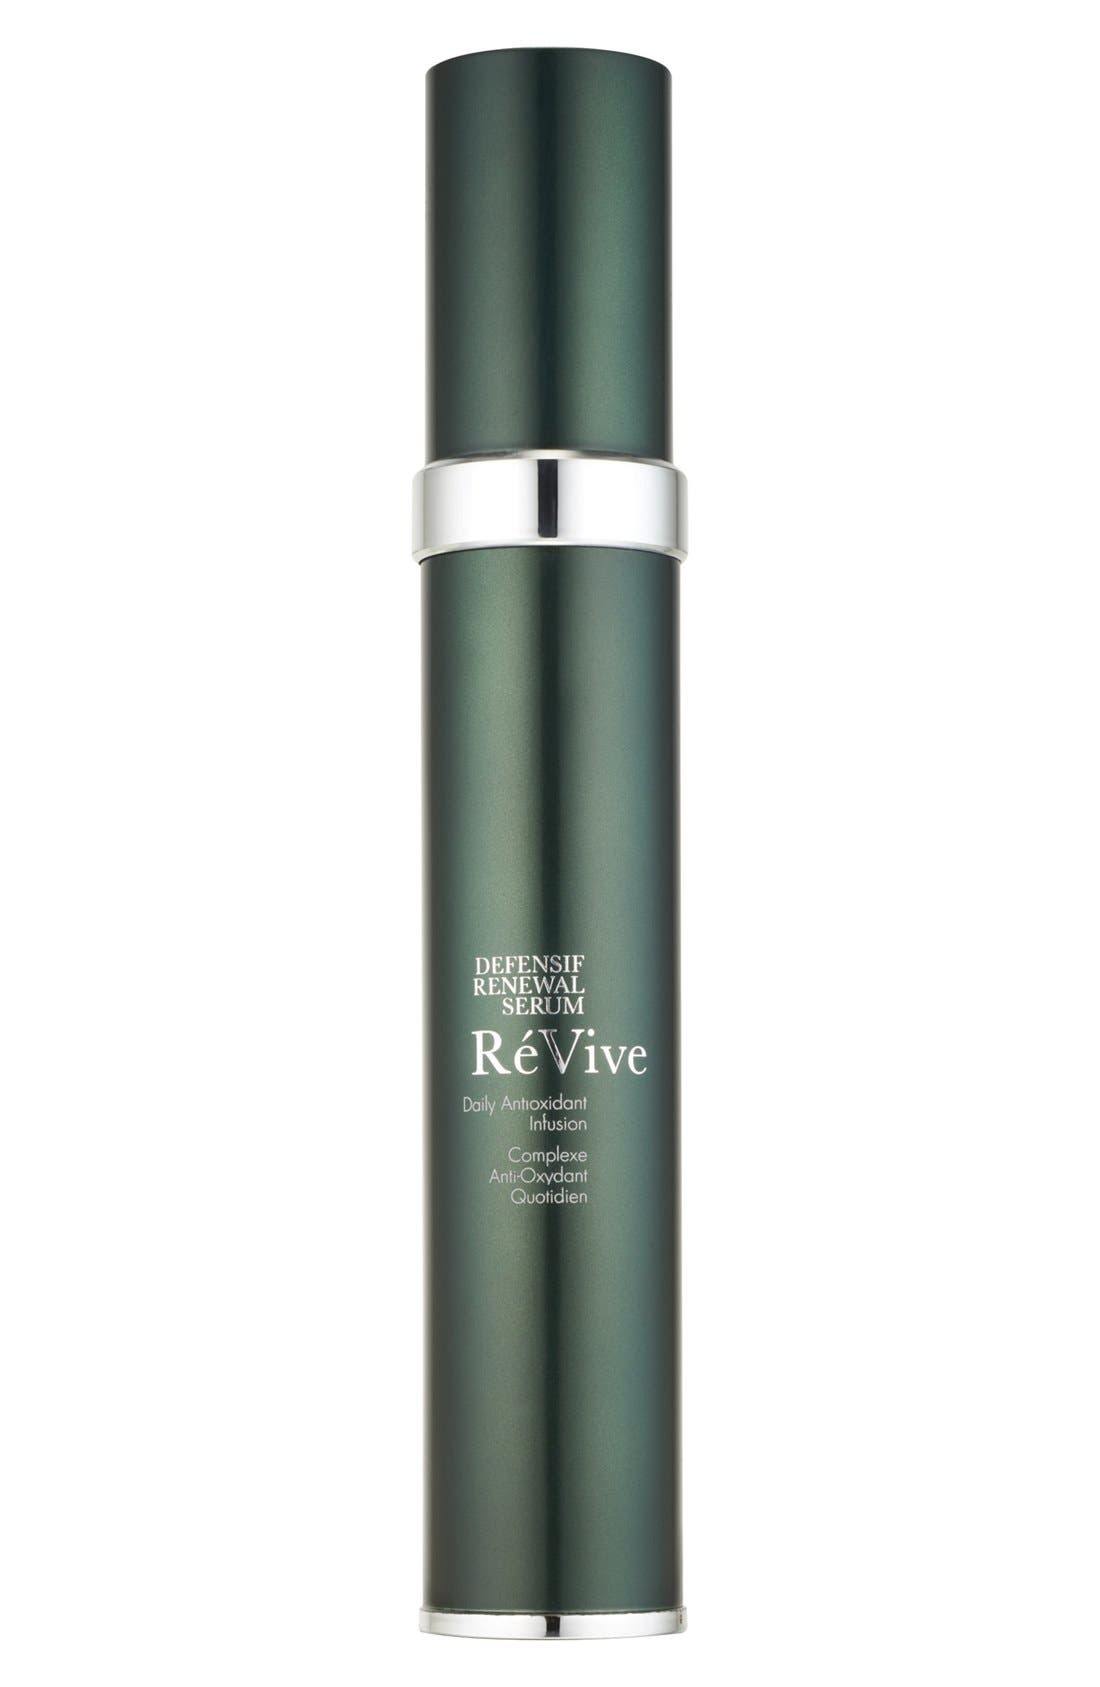 RéVive® Defensif Renewal Serum